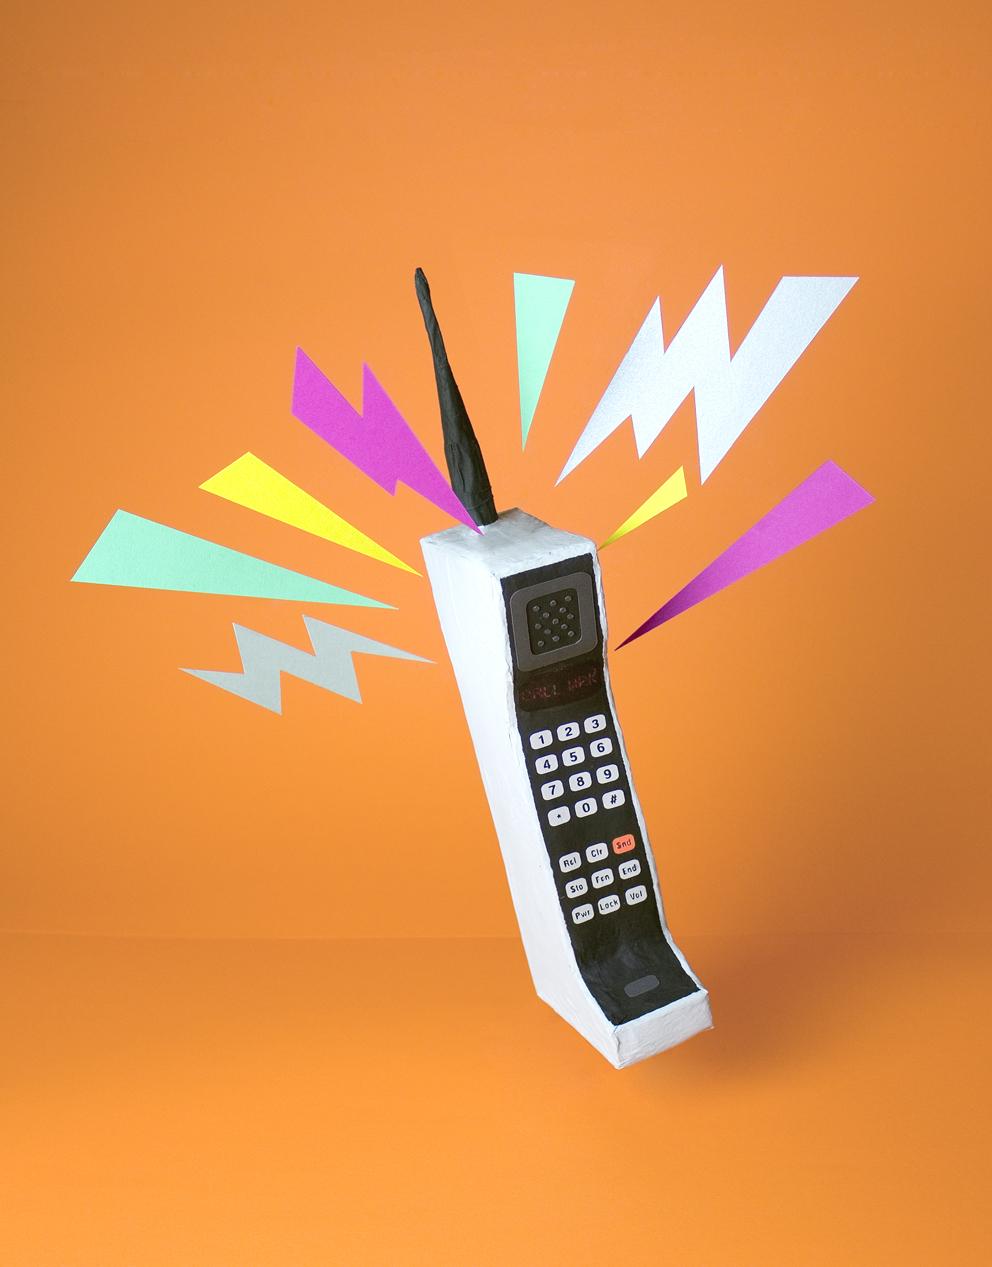 WRK_Graphicdesign_Tactile_Illustration_Papercraft_Motorola_DynaTAC8000X_Andrea Weber_DamounTamir.jpg